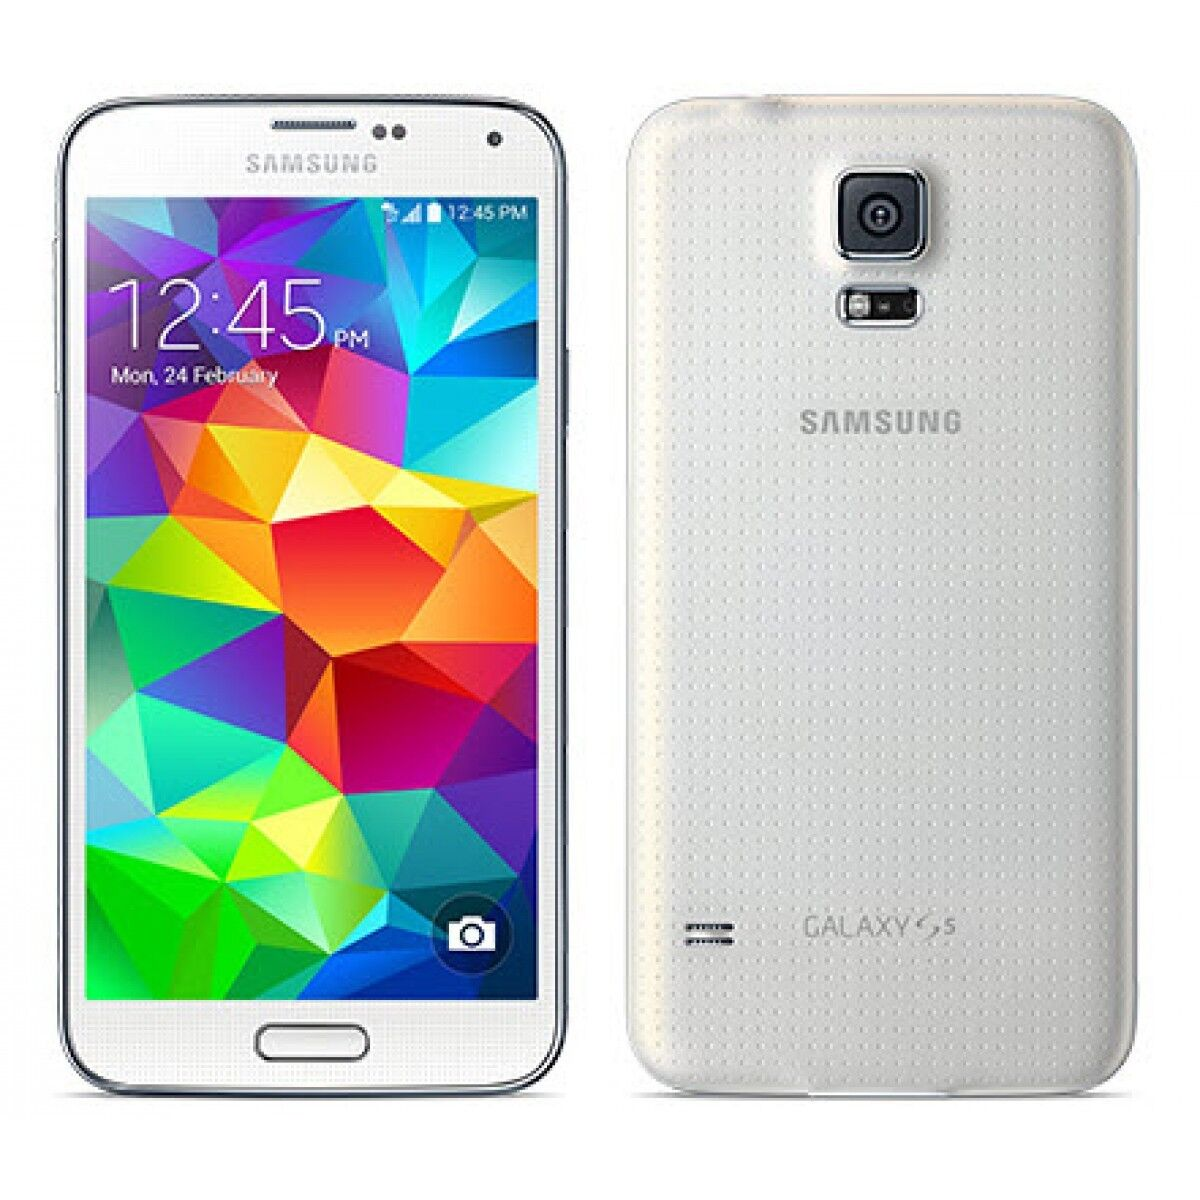 New In Box Samsung GALAXY S5 SM-G900V WHITE VERIZON Android PHONE